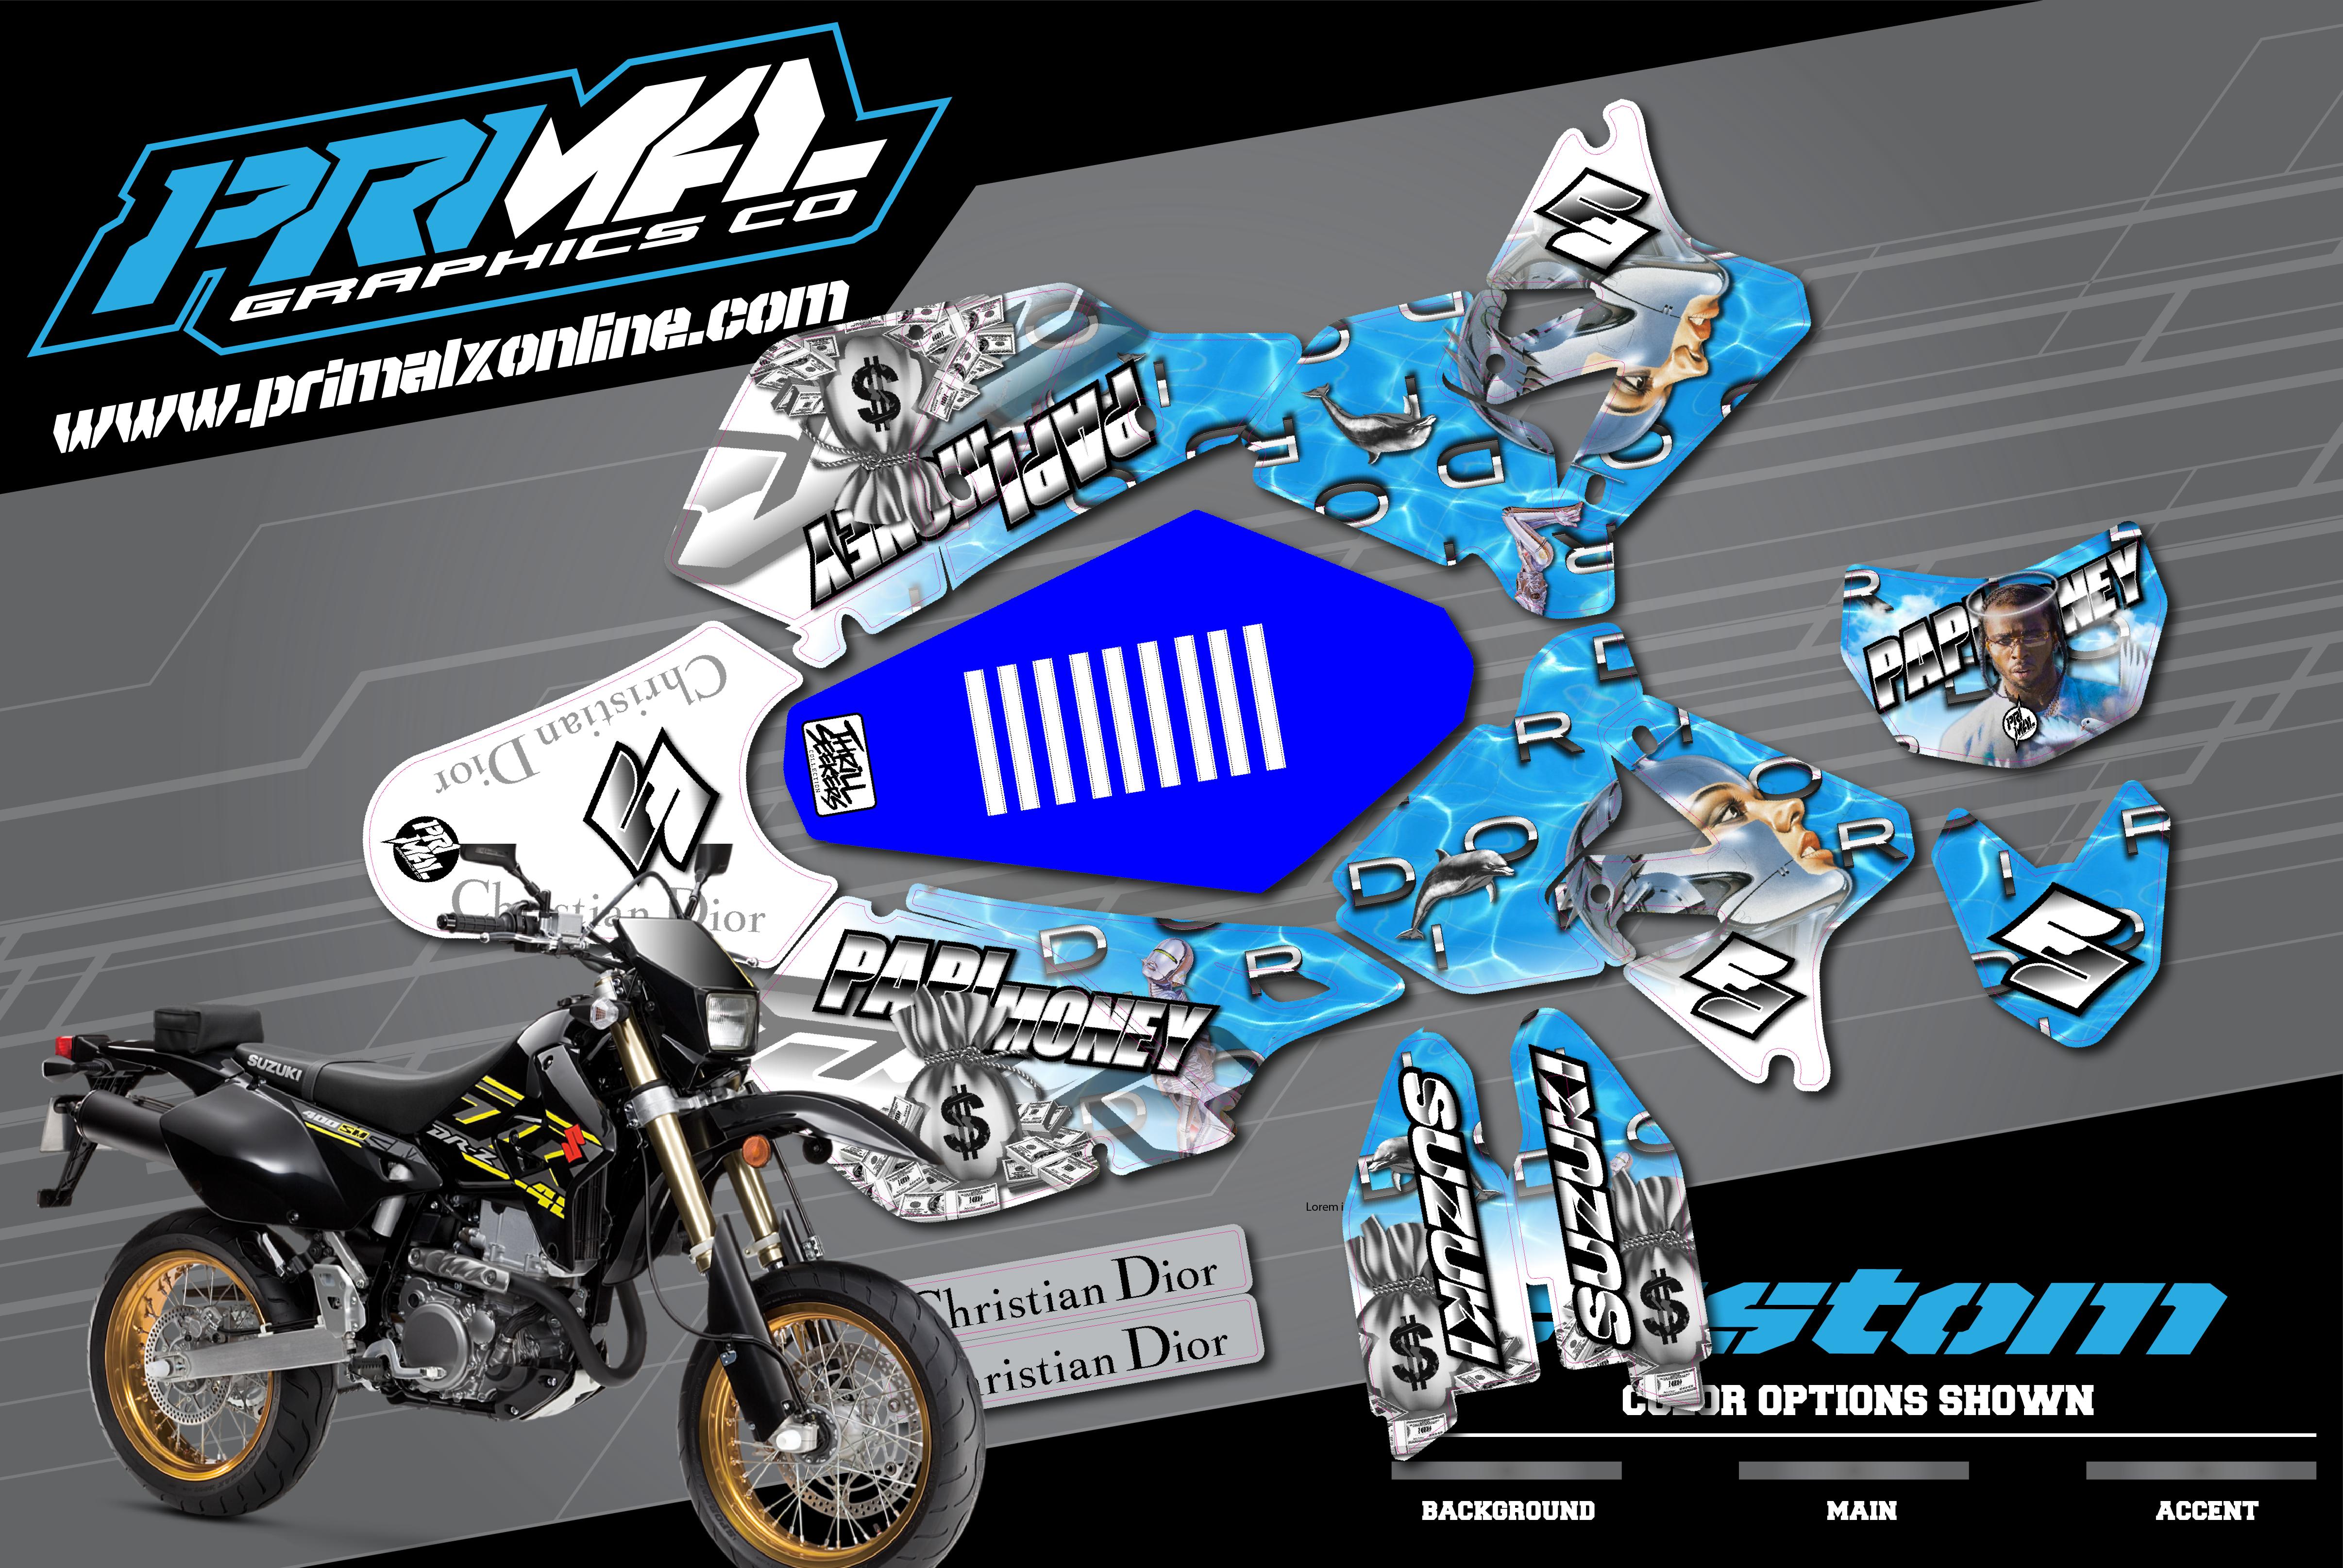 1_PRIMAL-X-MOTORSPORTS-PRIMAL-GRAPHICS-CO-SUZUKI-DRZ400SM-SUPERMOTO-MOTOCROSS-GRAPHICS-BIKELIFE-DIOR-CHROME-01